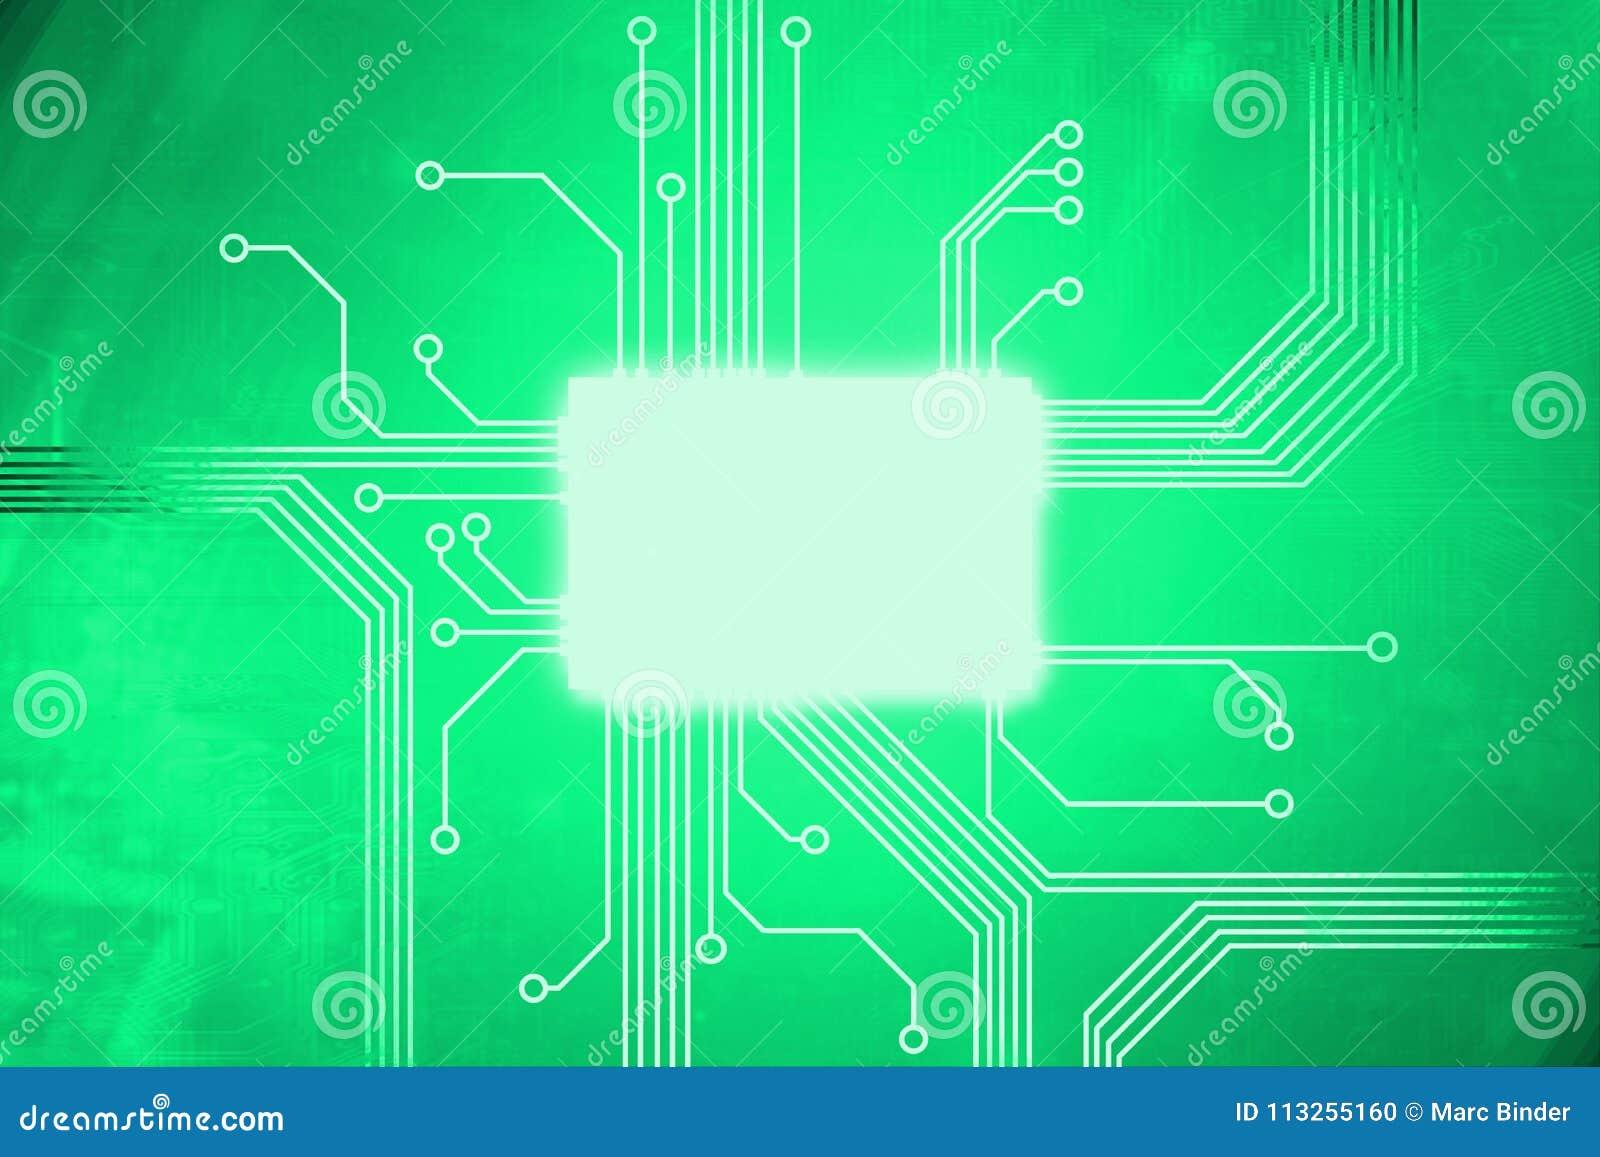 De groene Gekleurde kern van de digitale computerspaander